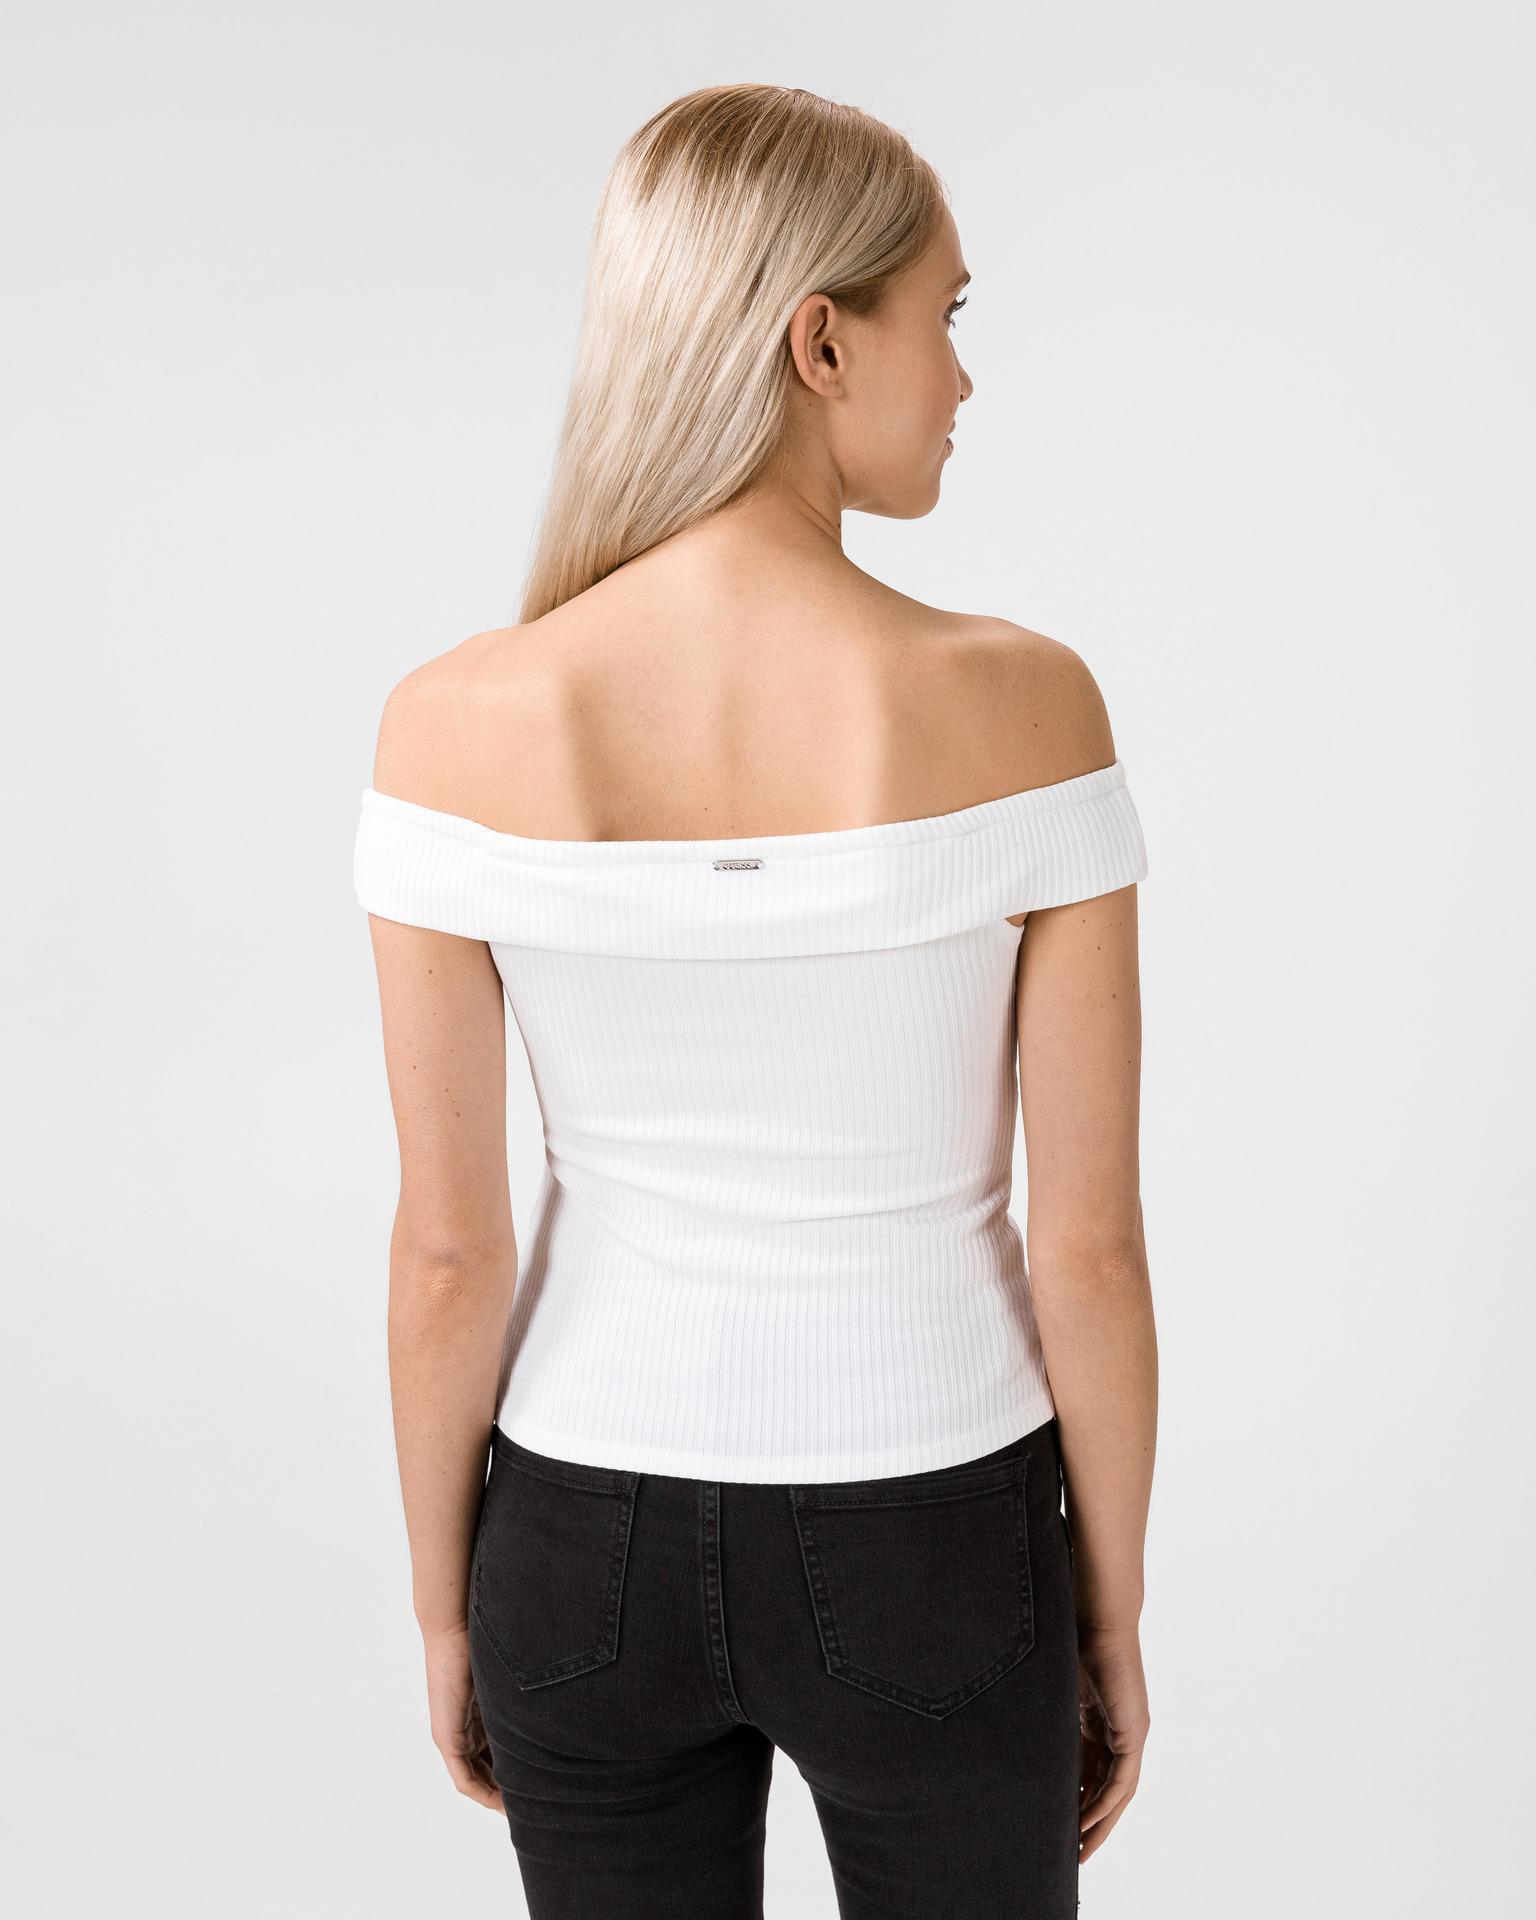 Guess Maglietta donna bianco Top